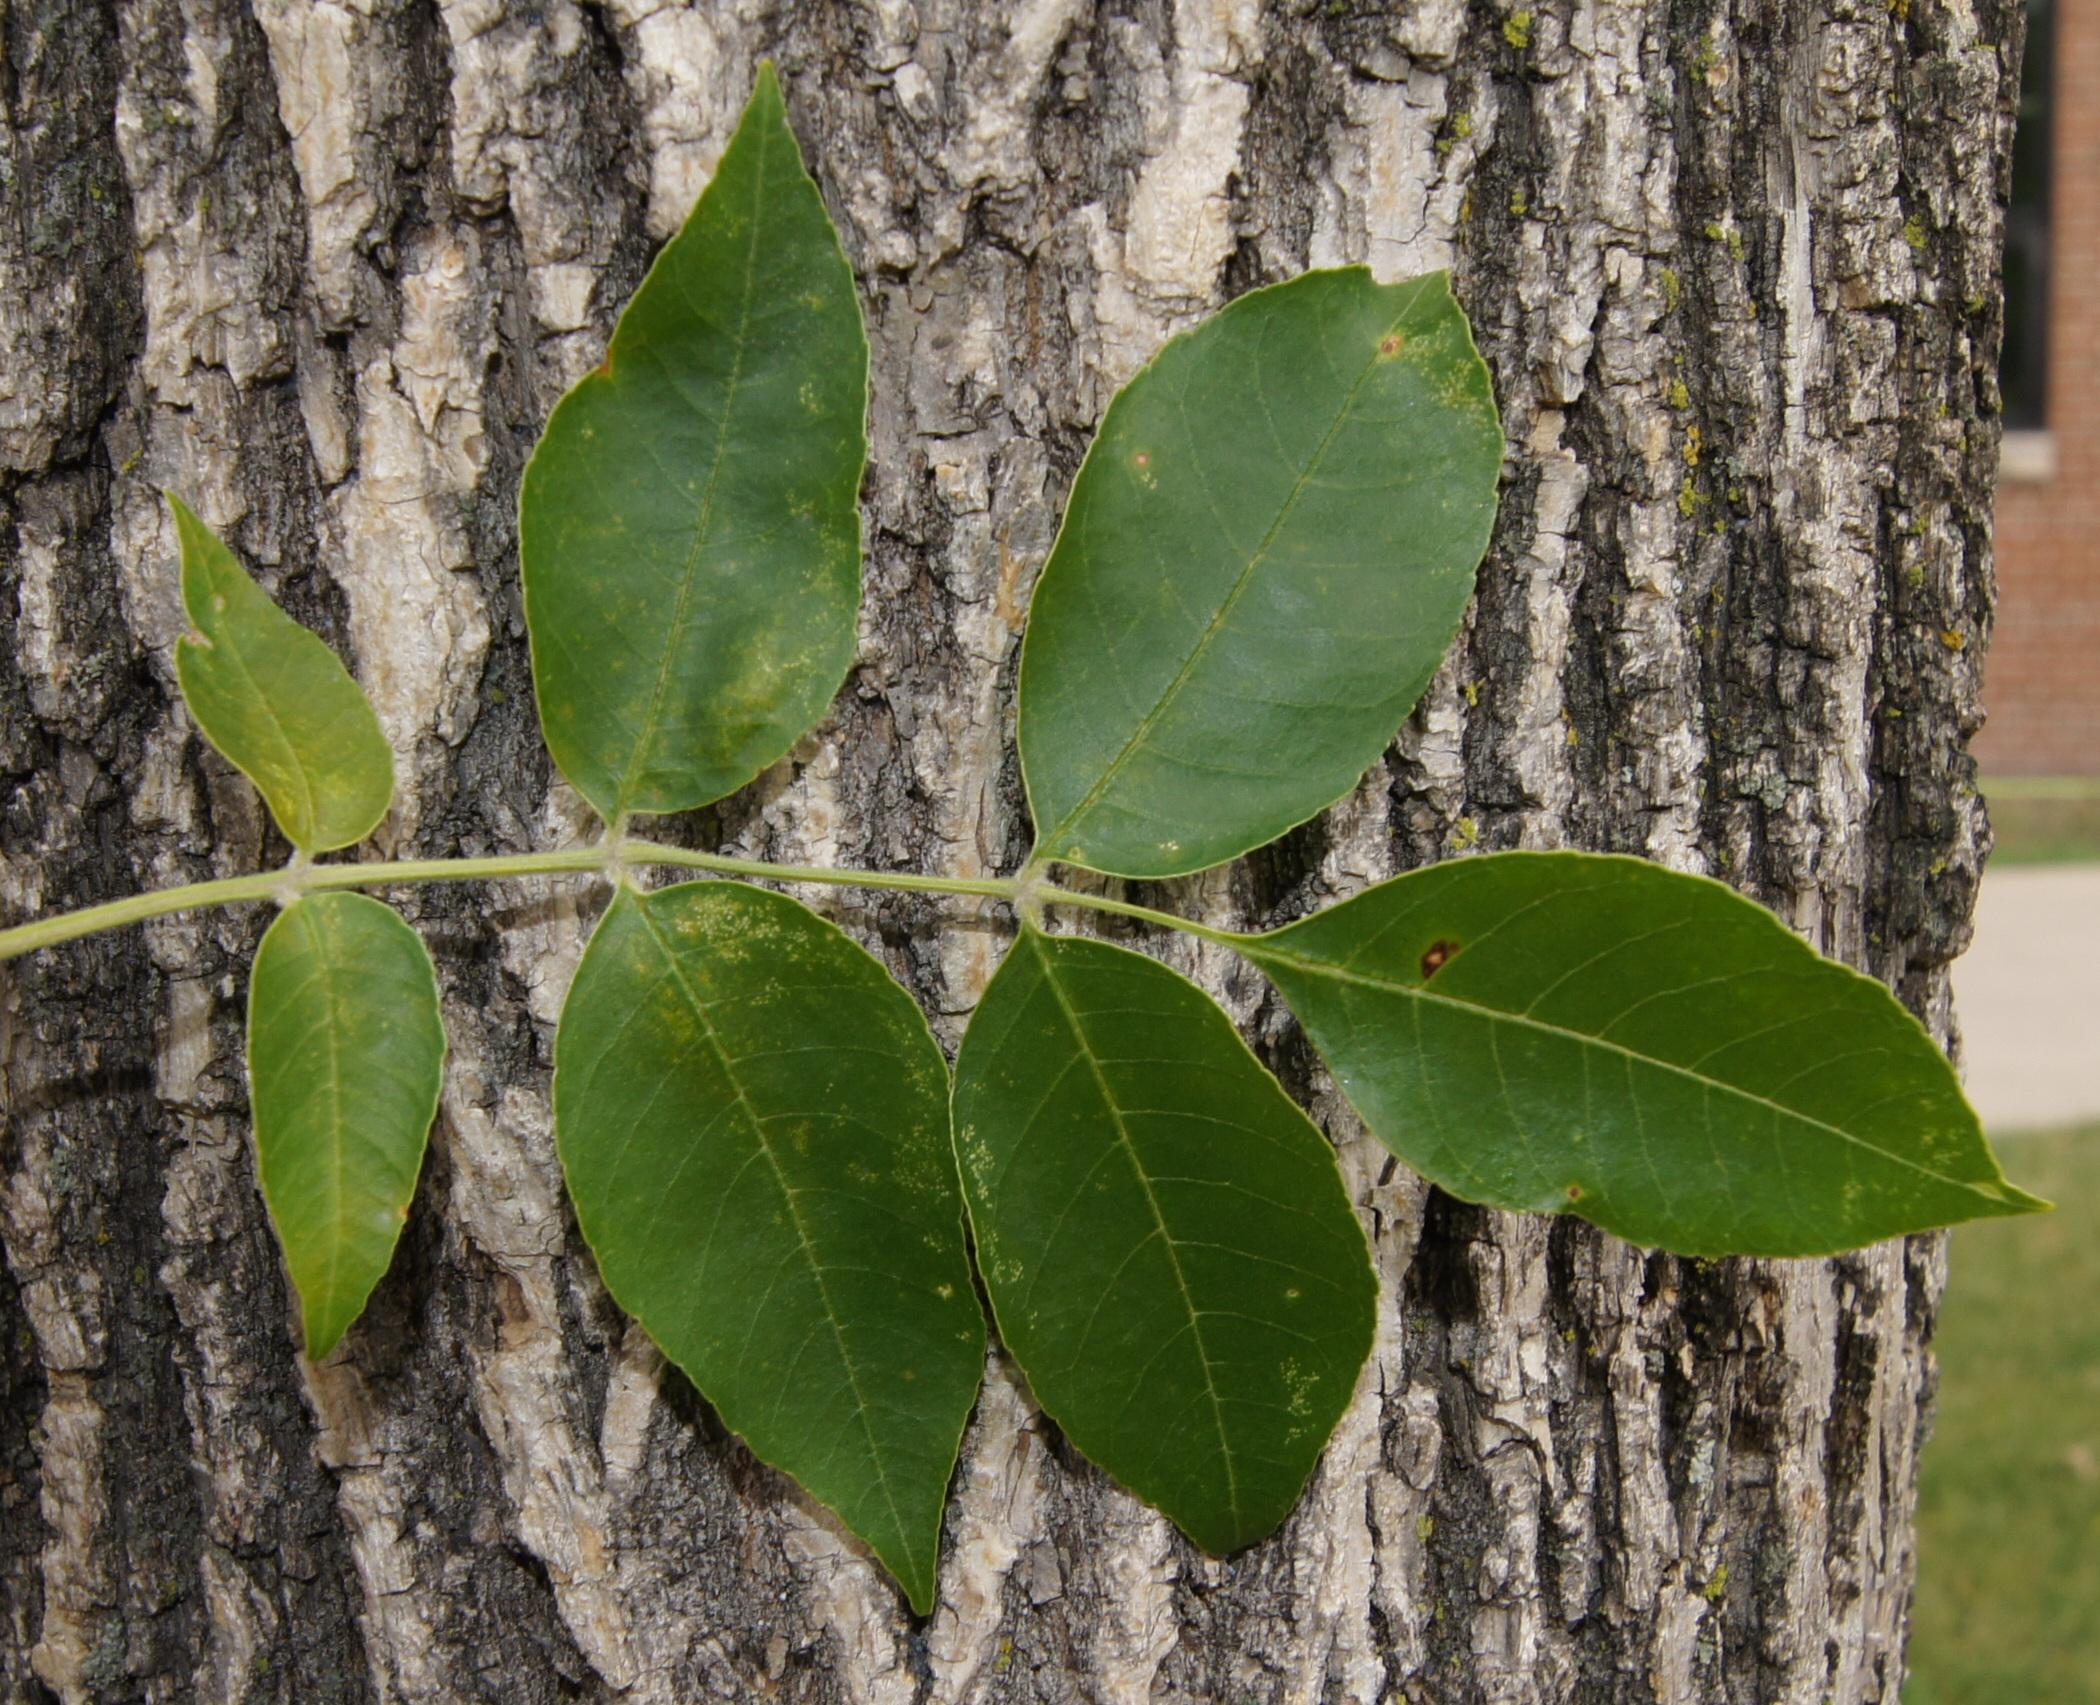 Green ash trees make up 60% of North Dakota's native forests. (NDSU photo)